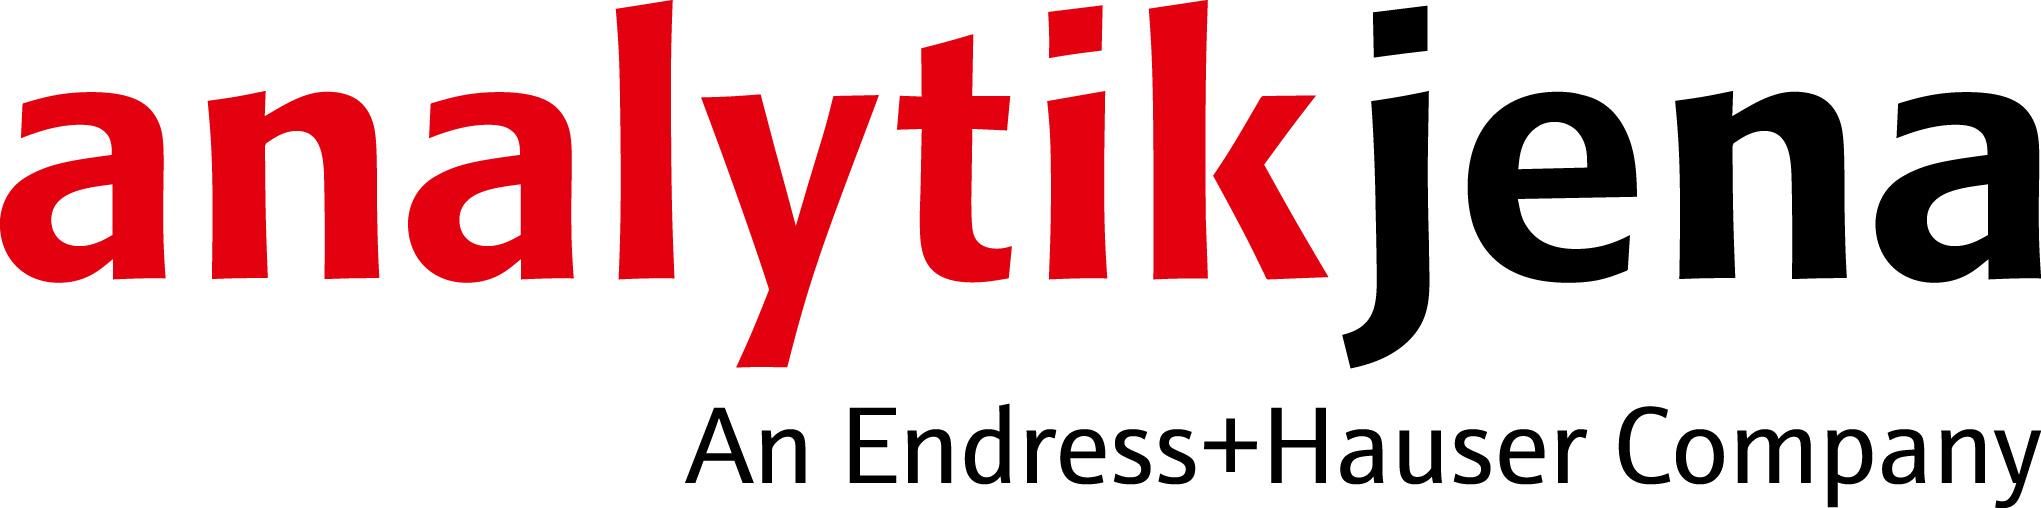 Analytik-Jena-Logo